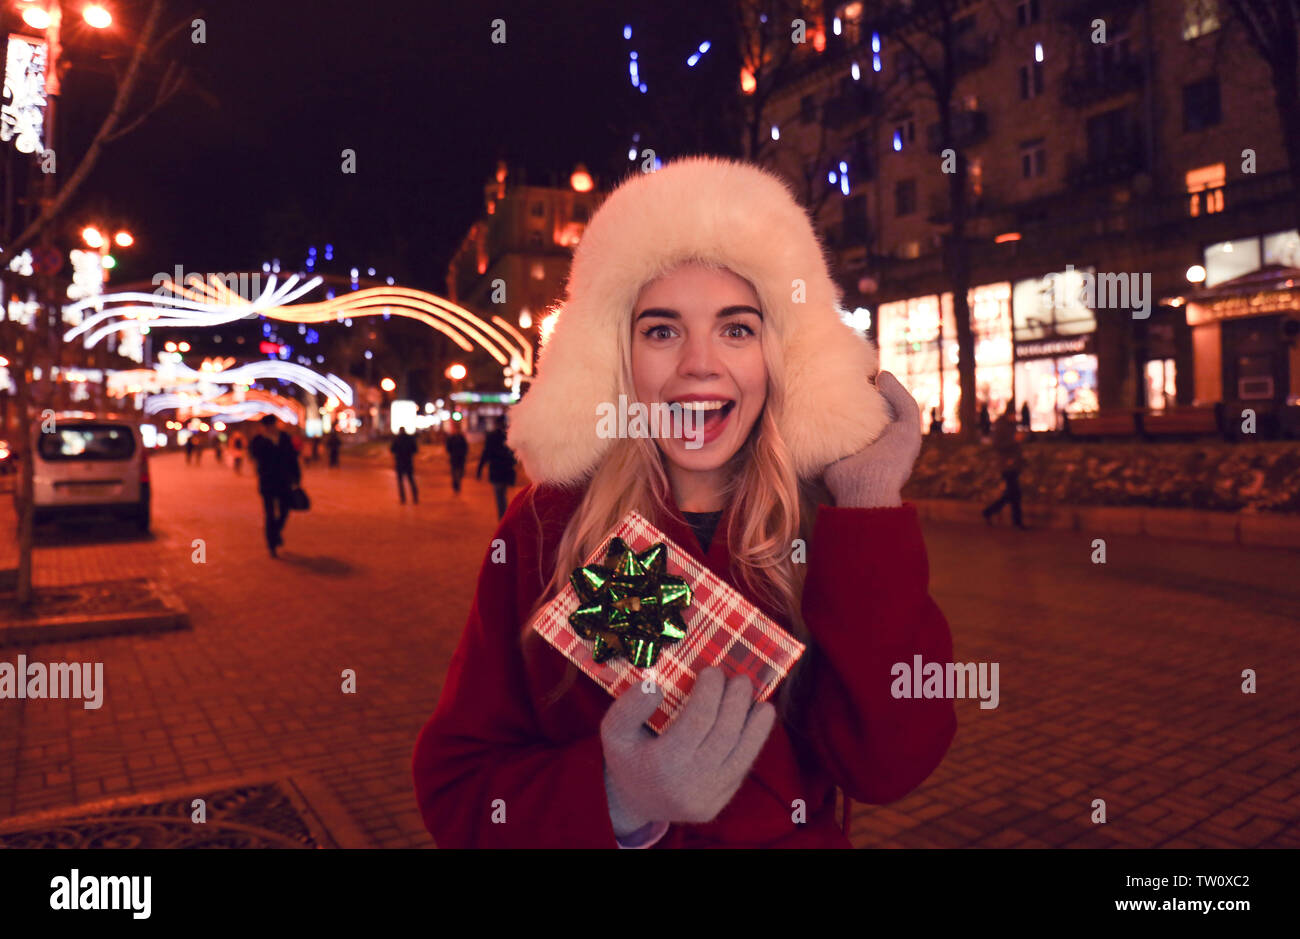 Woman with gift box on Christmas market - Stock Image